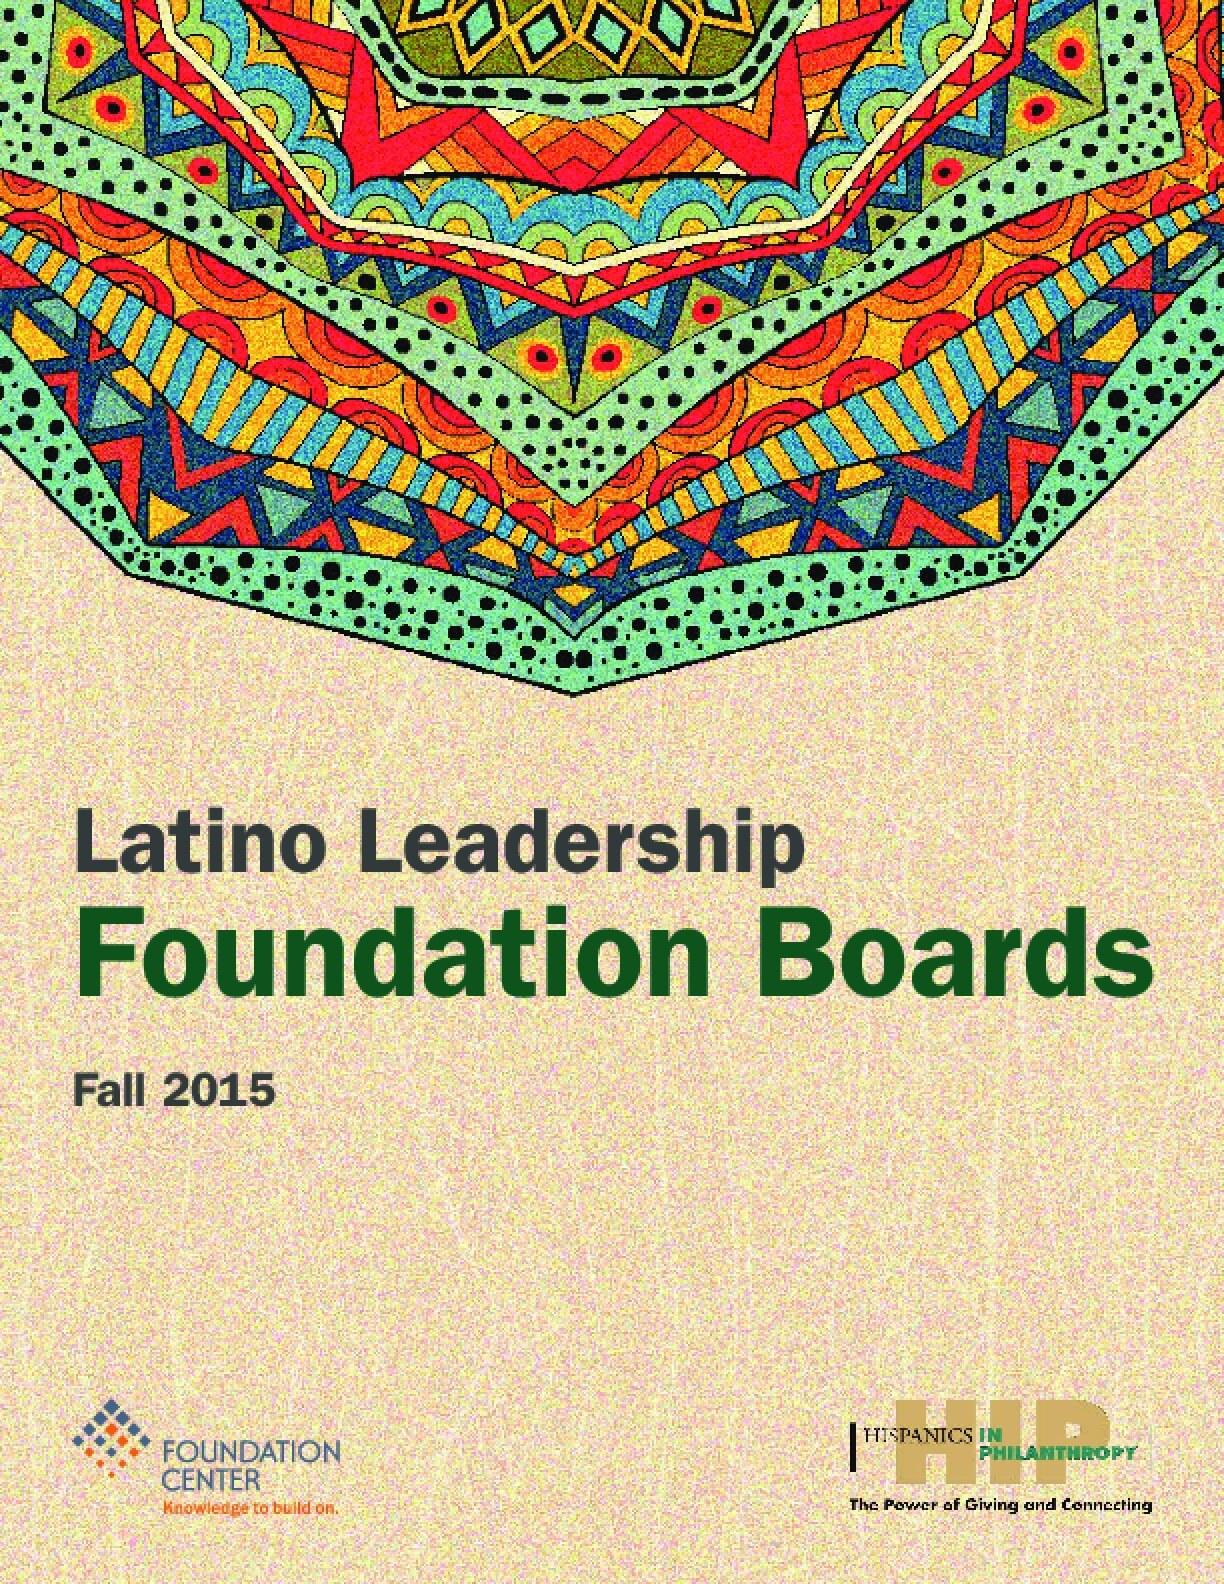 Latino Leadership: Foundation Boards